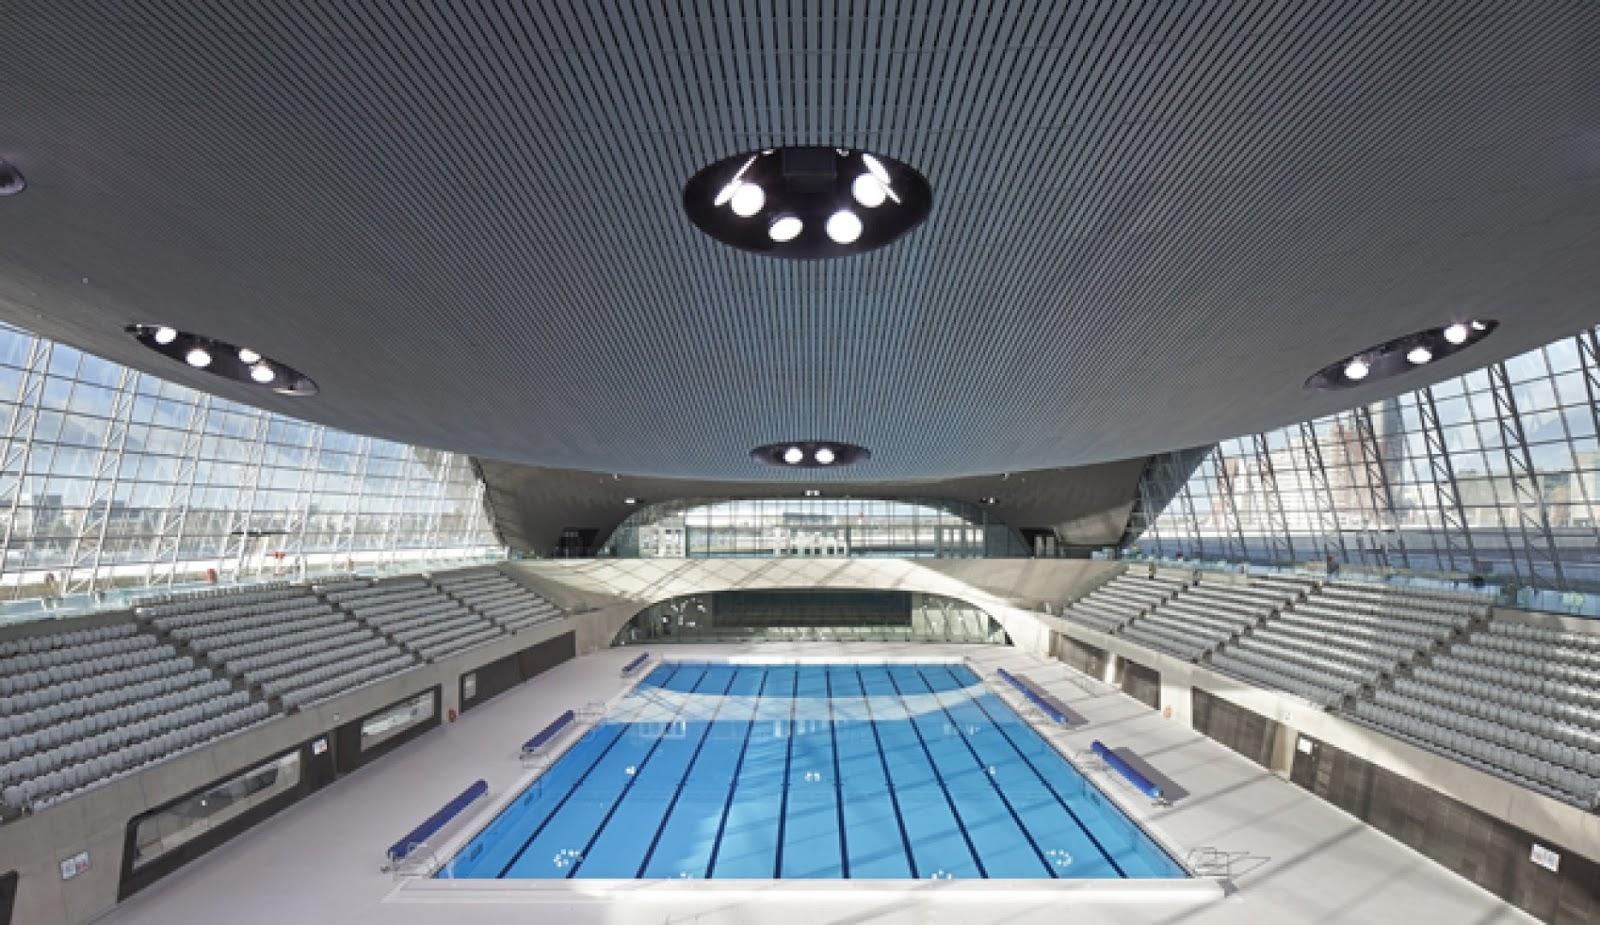 Walk And Swim 1 3 Stratford To London Aquatics Centre London European Club Londres England